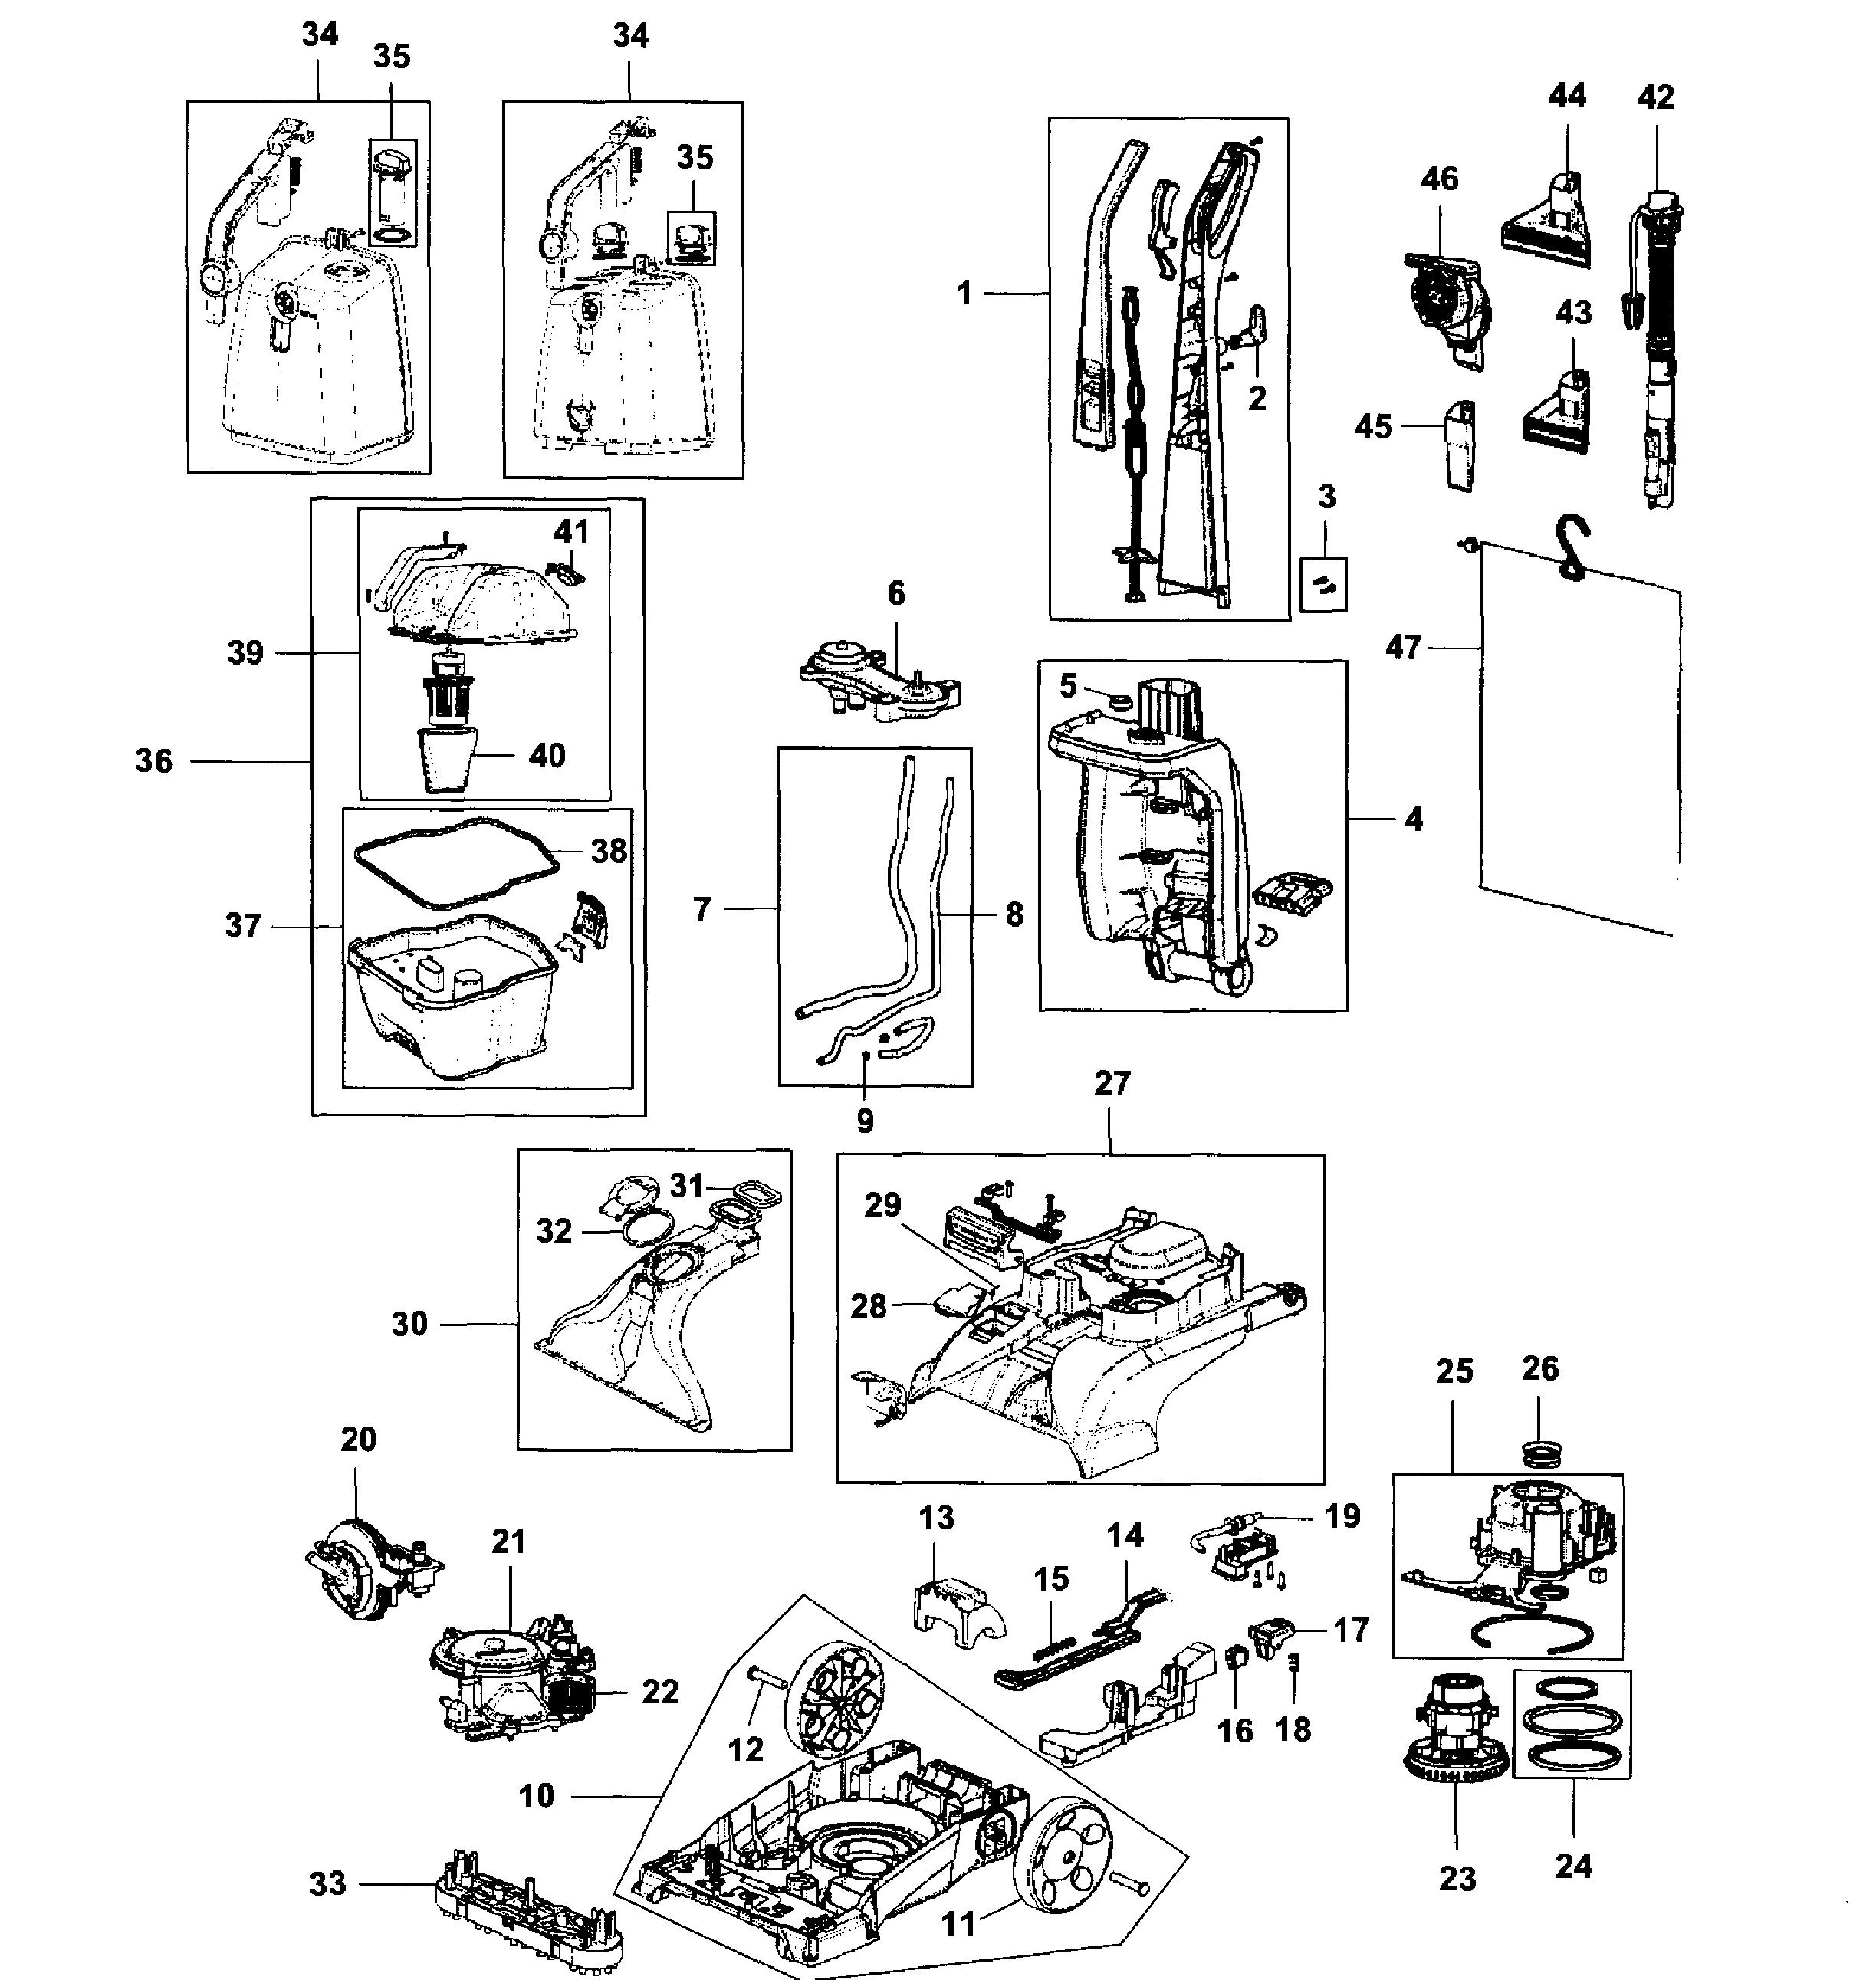 How to clean hoover steamvac spinscrub